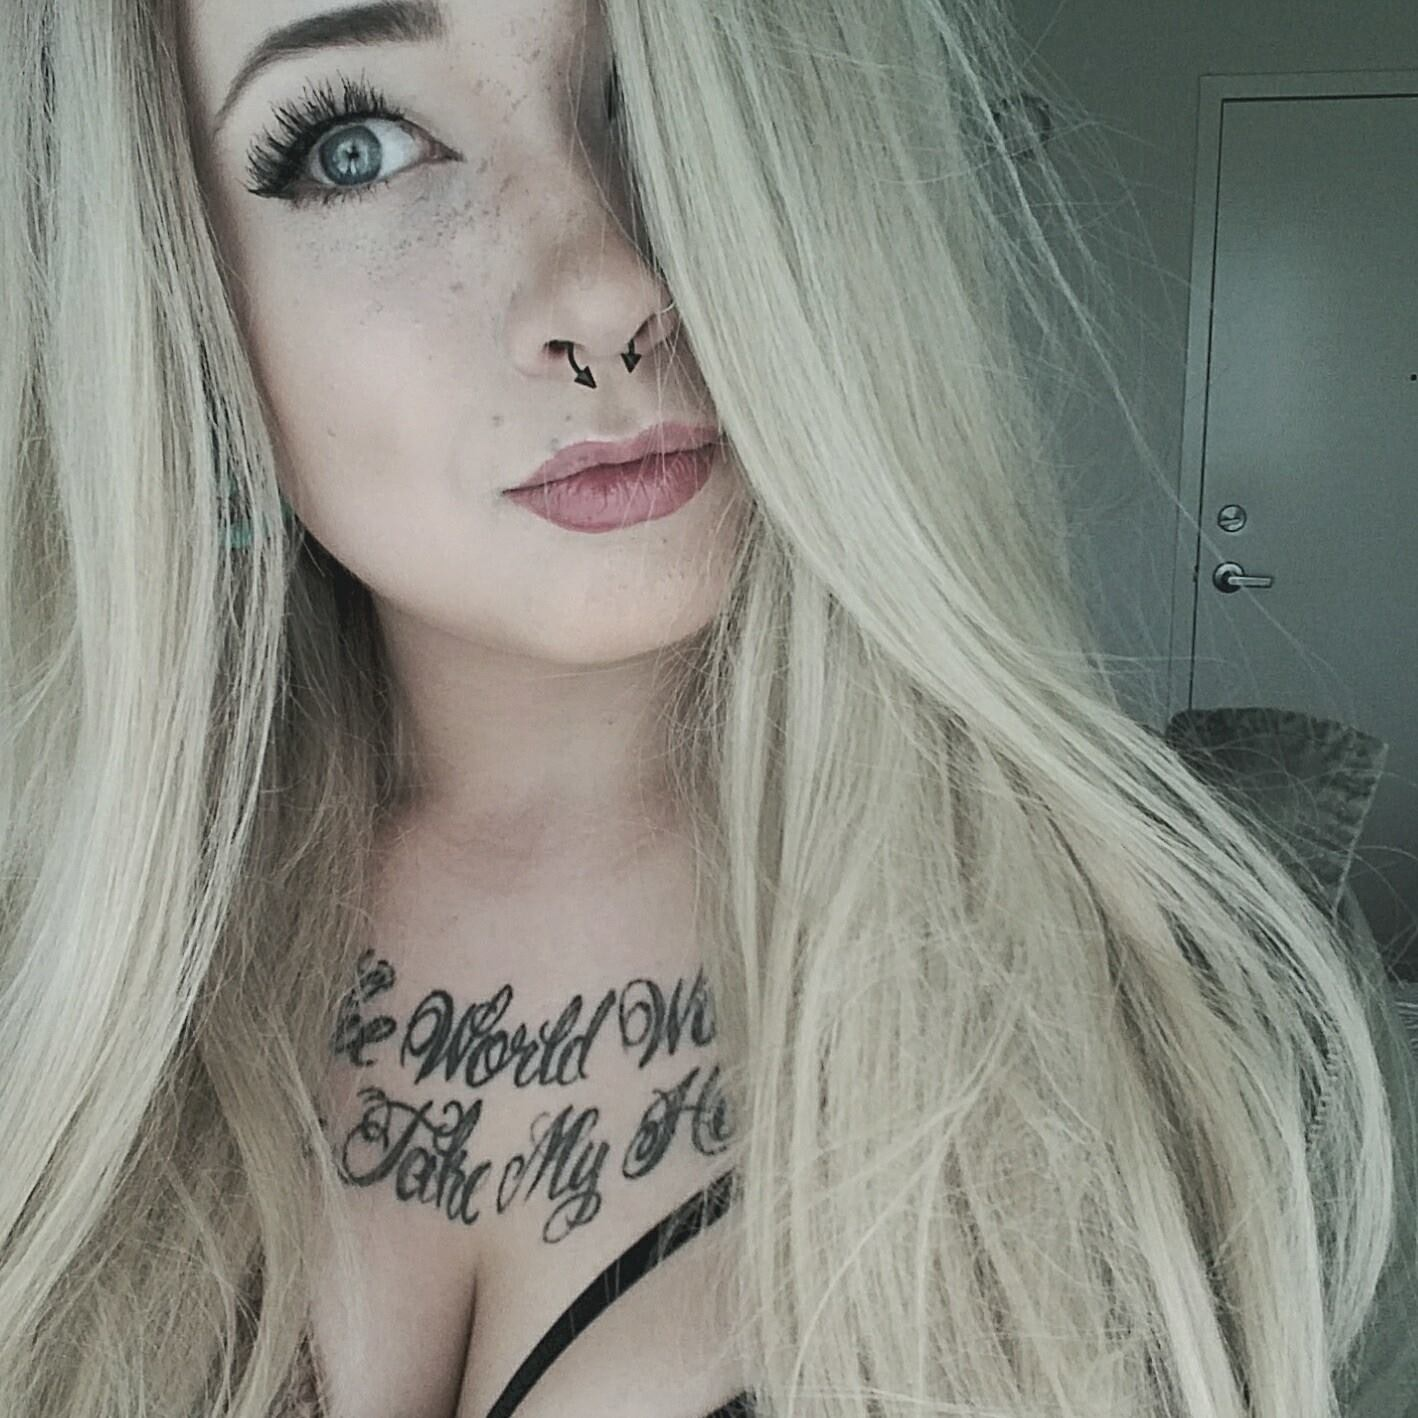 Shayna P.